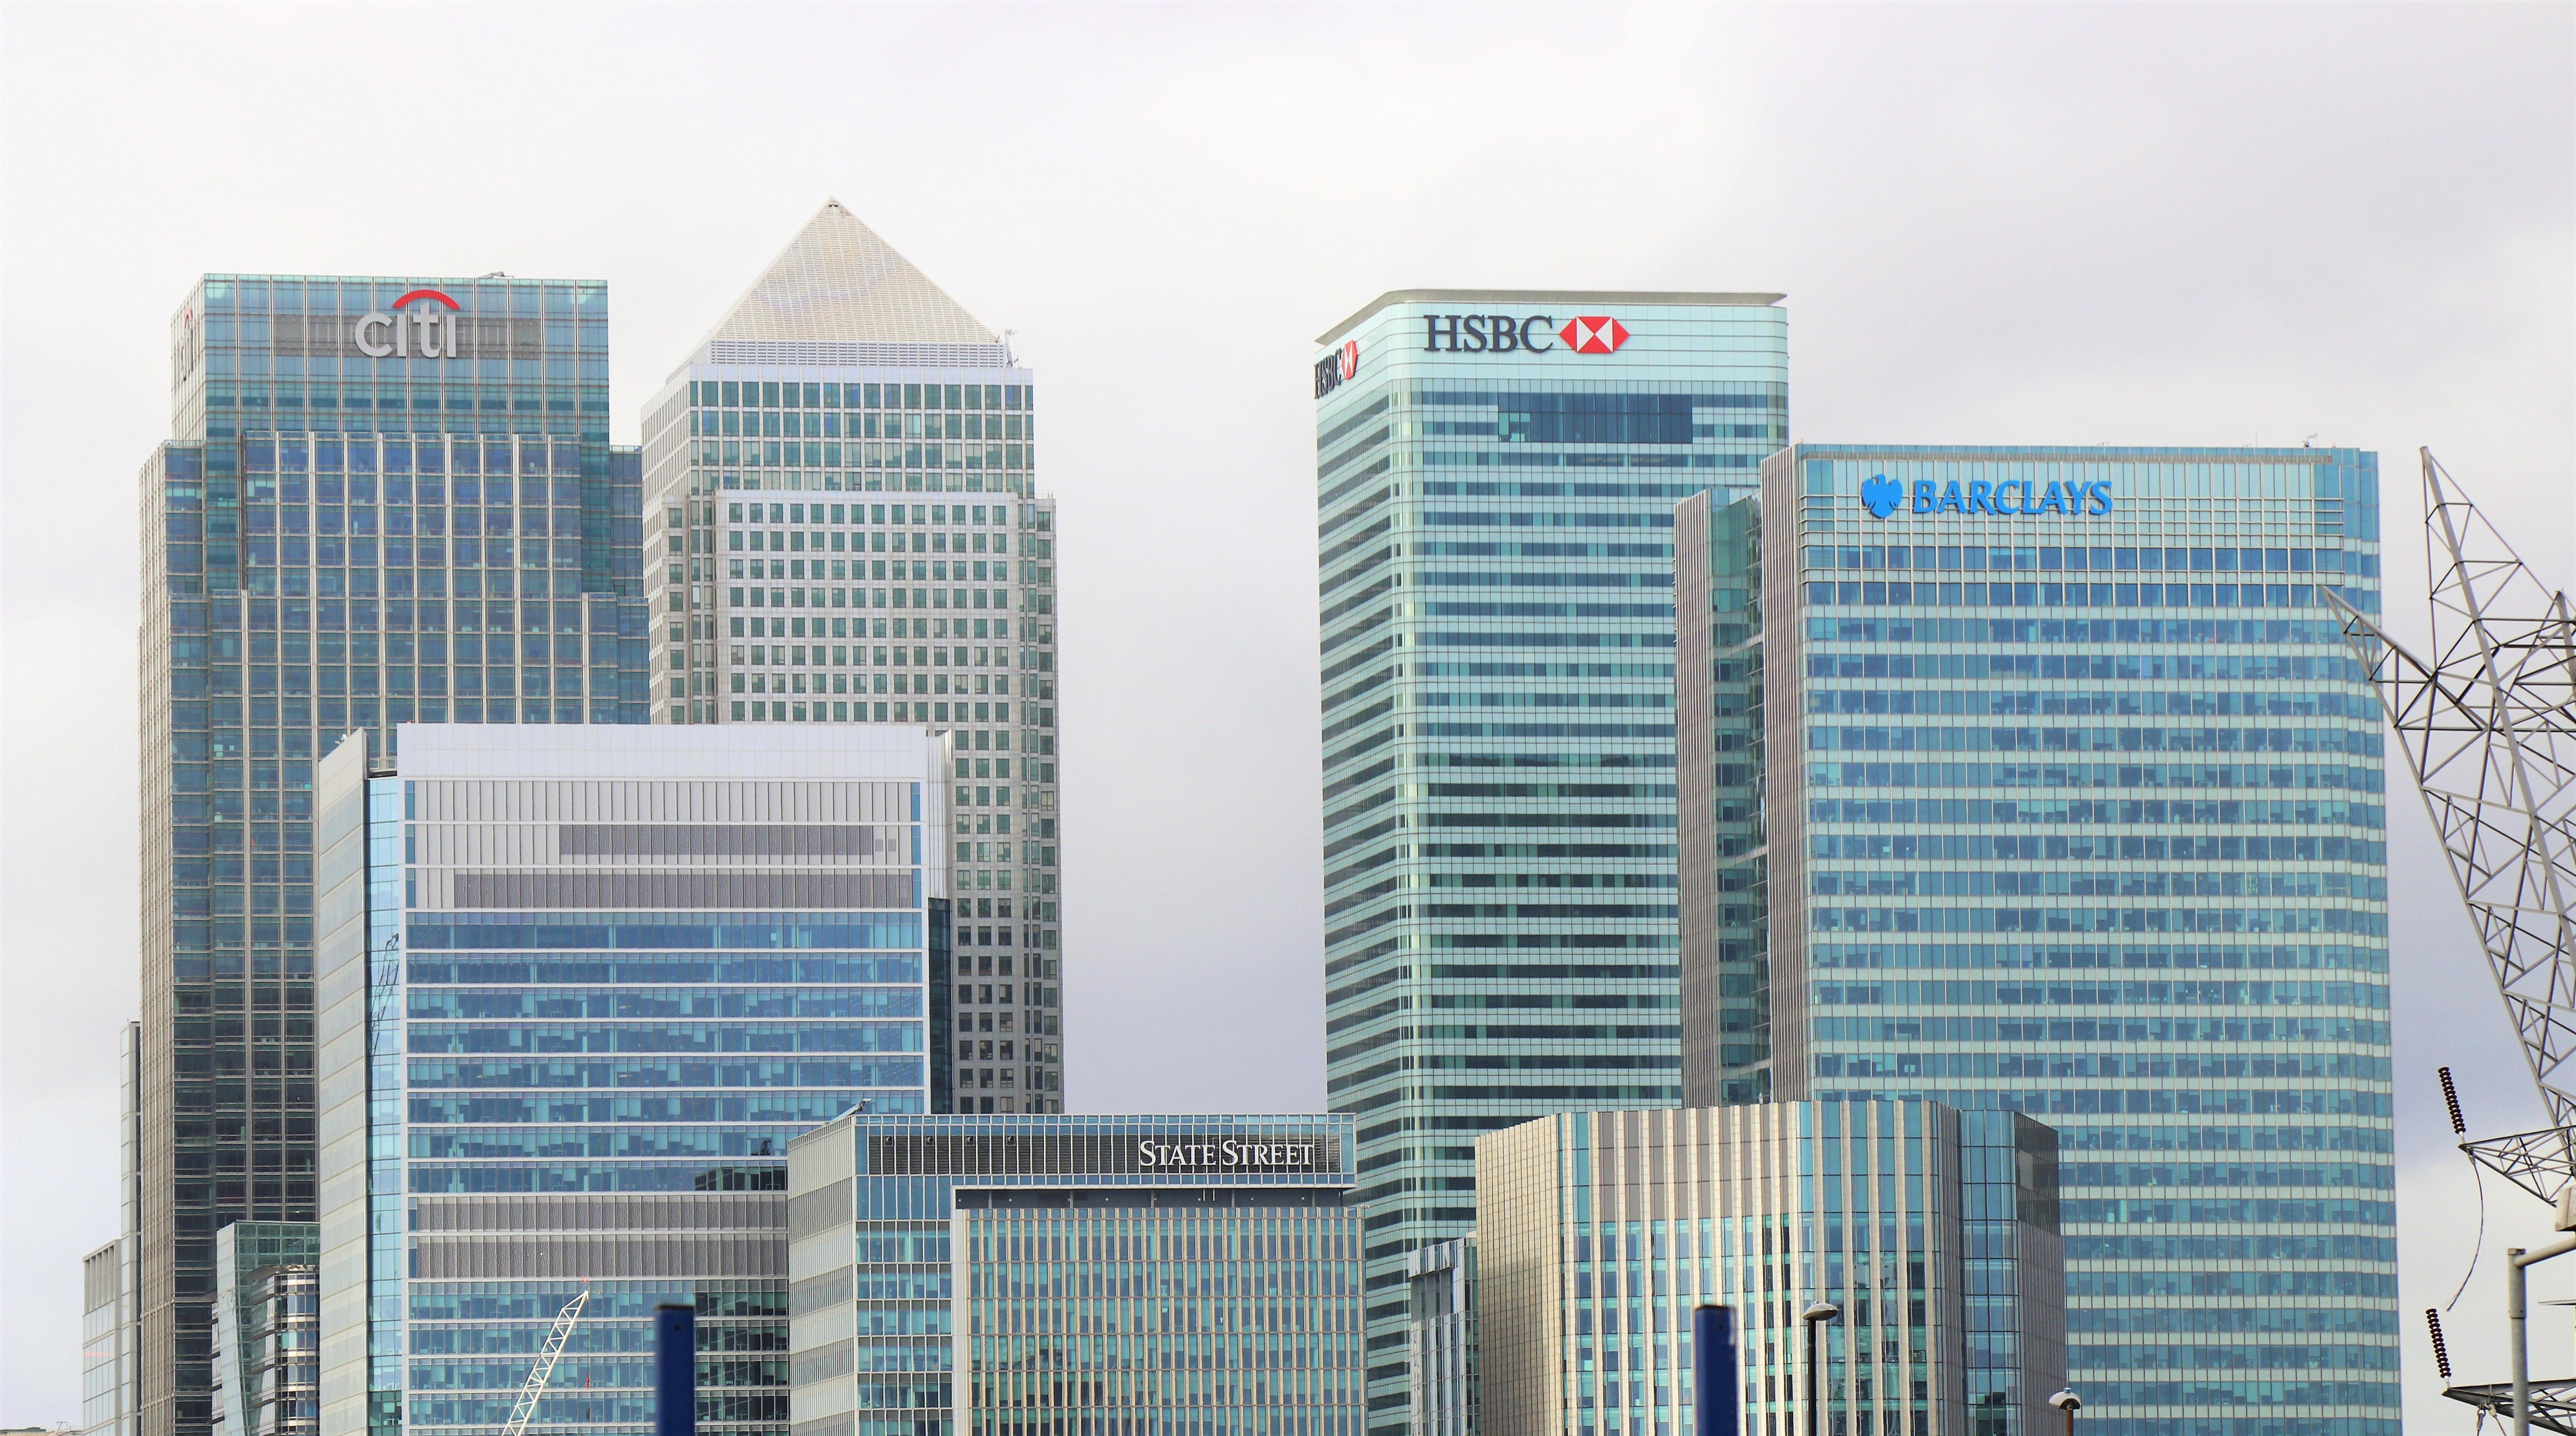 architectural-design-architecture-banks-barclays-351264